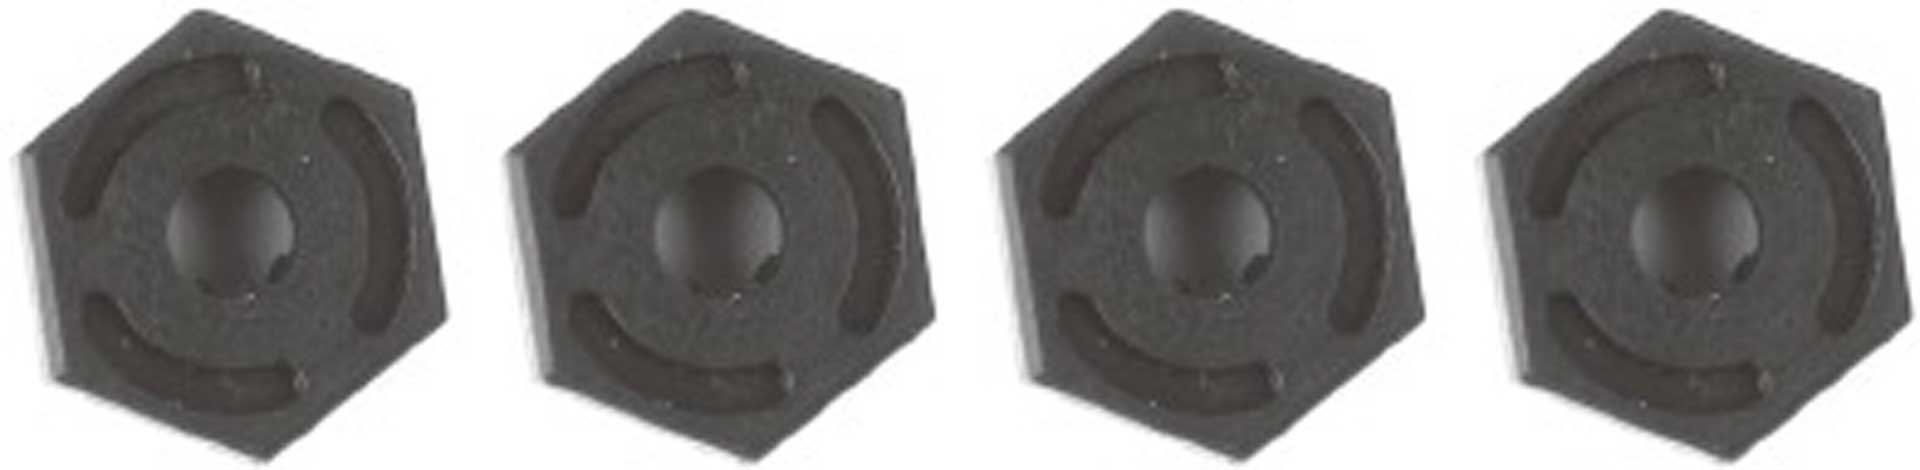 ABSIMA Hex Wheel Hubs (4PCS) 1/14 Serie